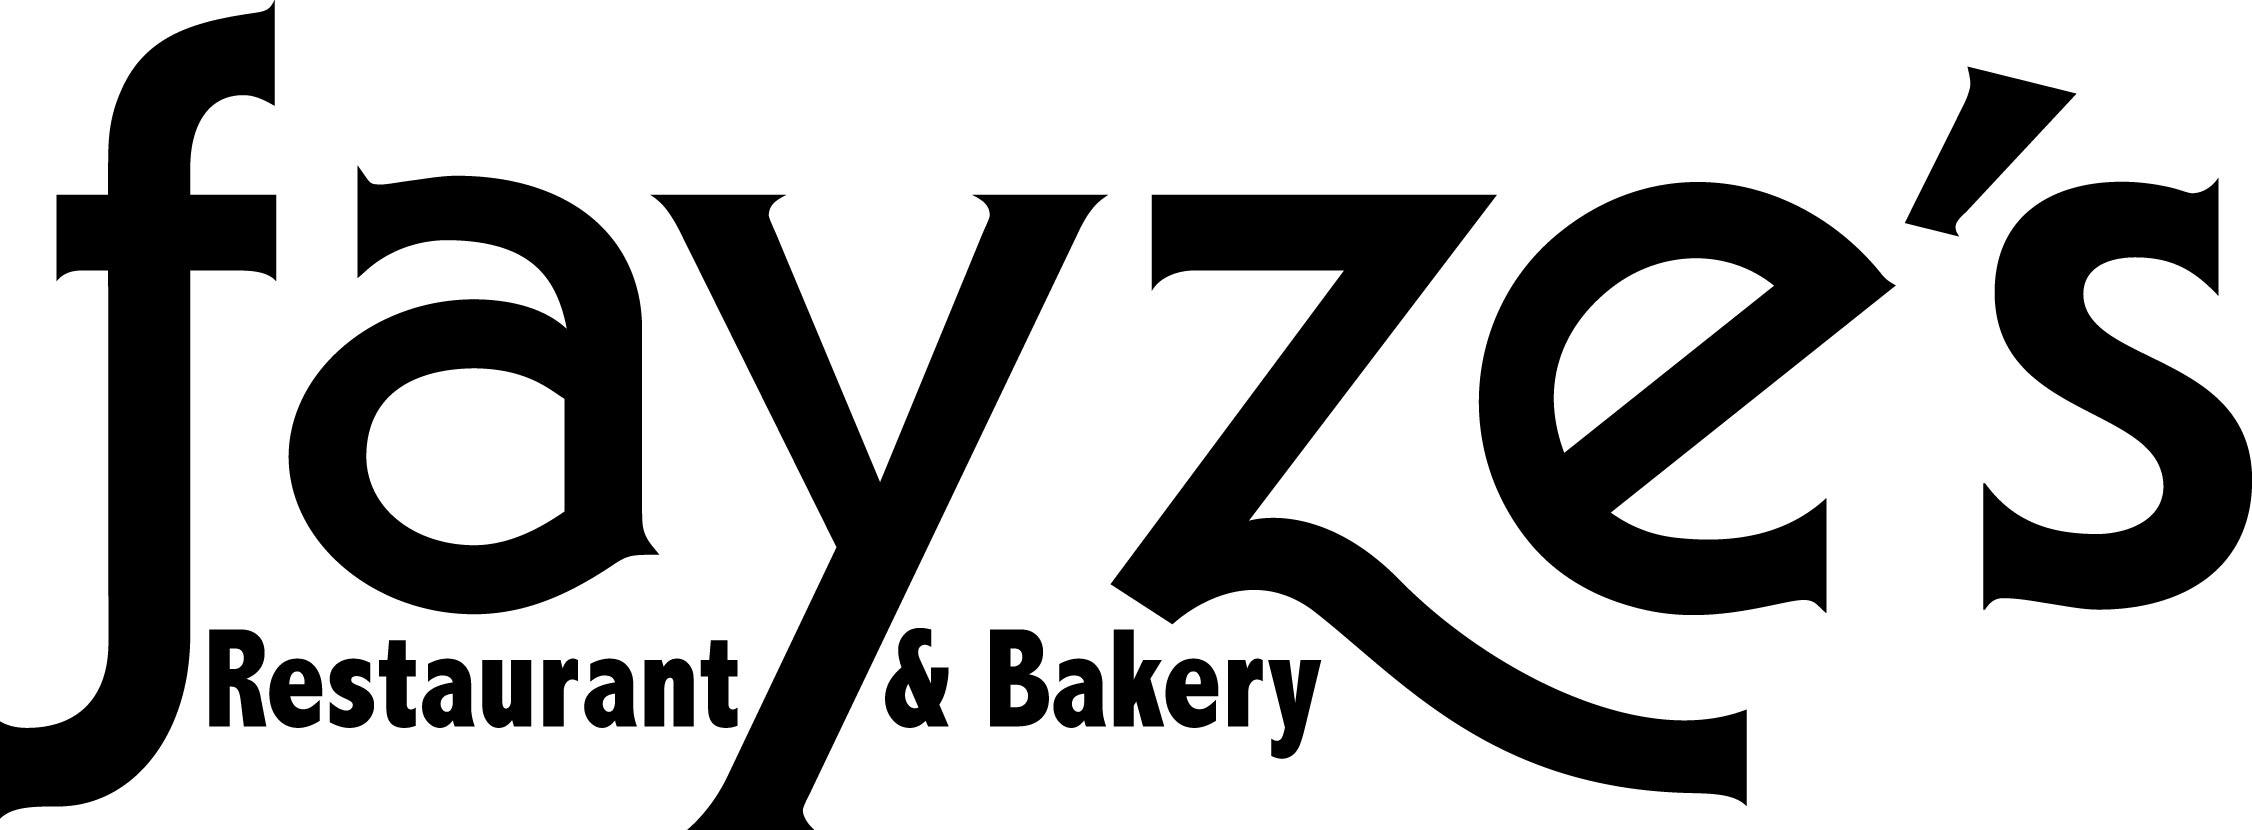 Fayze's Restaurant Week @ Fayze's Restaurant  Bakery